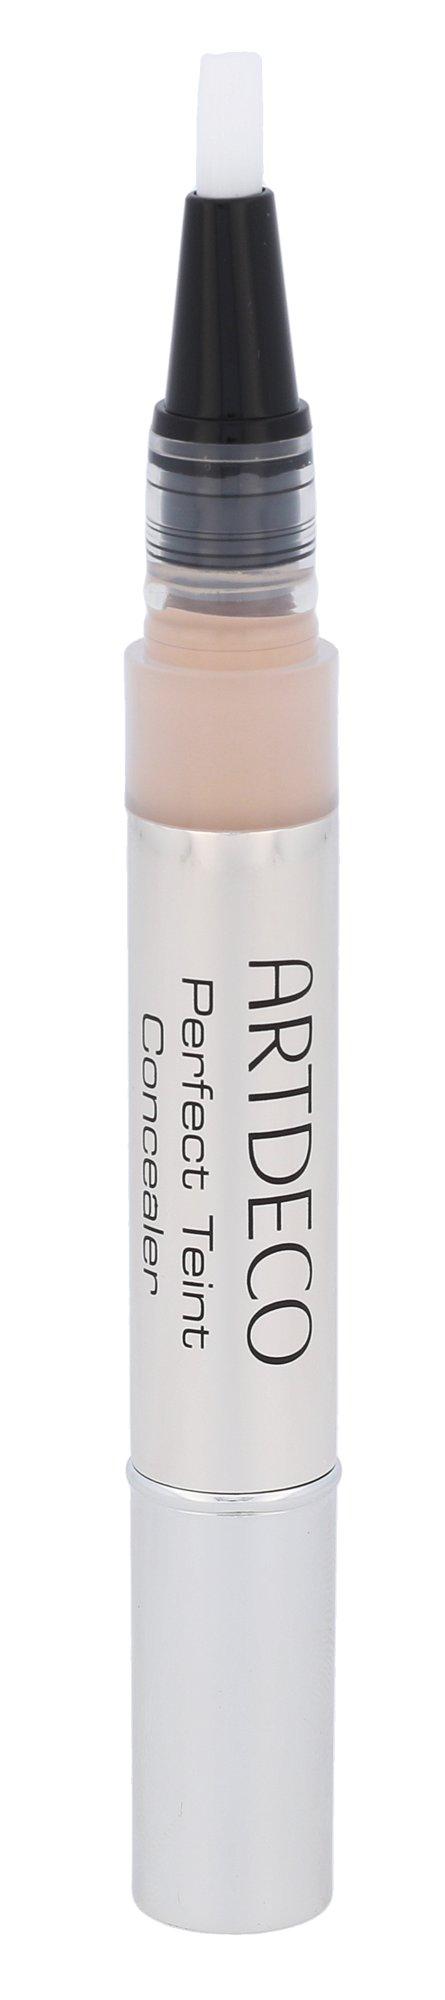 Artdeco Perfect Teint Concealer (7 Olive) 2 ml 92310